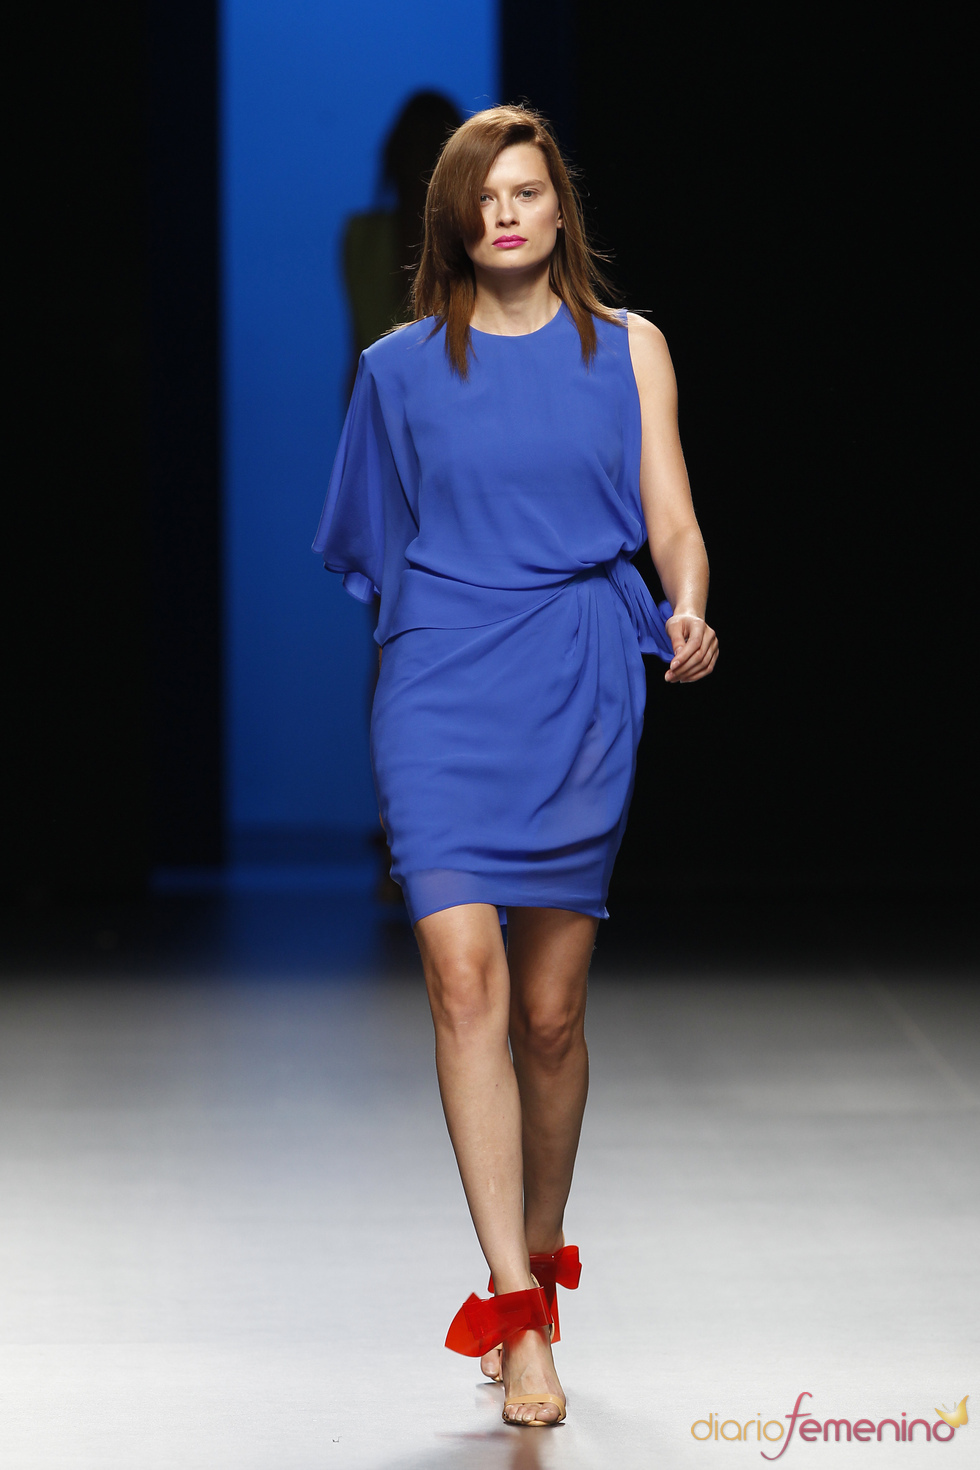 Cibeles Madrid Fashion Week 09-2010: Juanjo Oliva